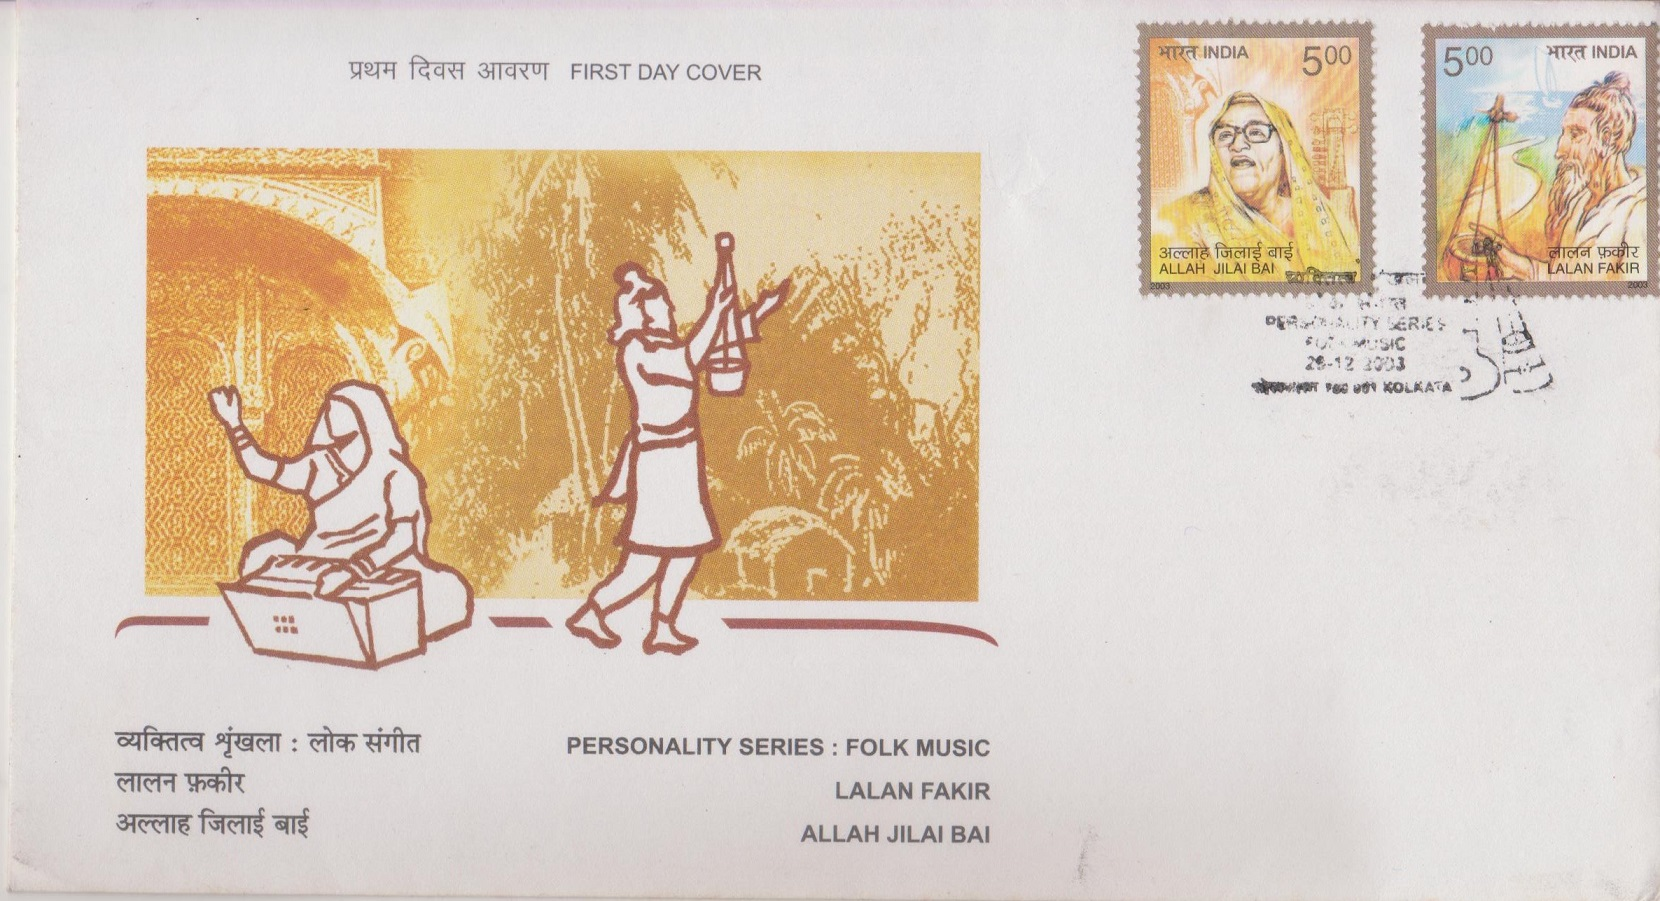 Lalon Fakir and Allah Jilai Bai